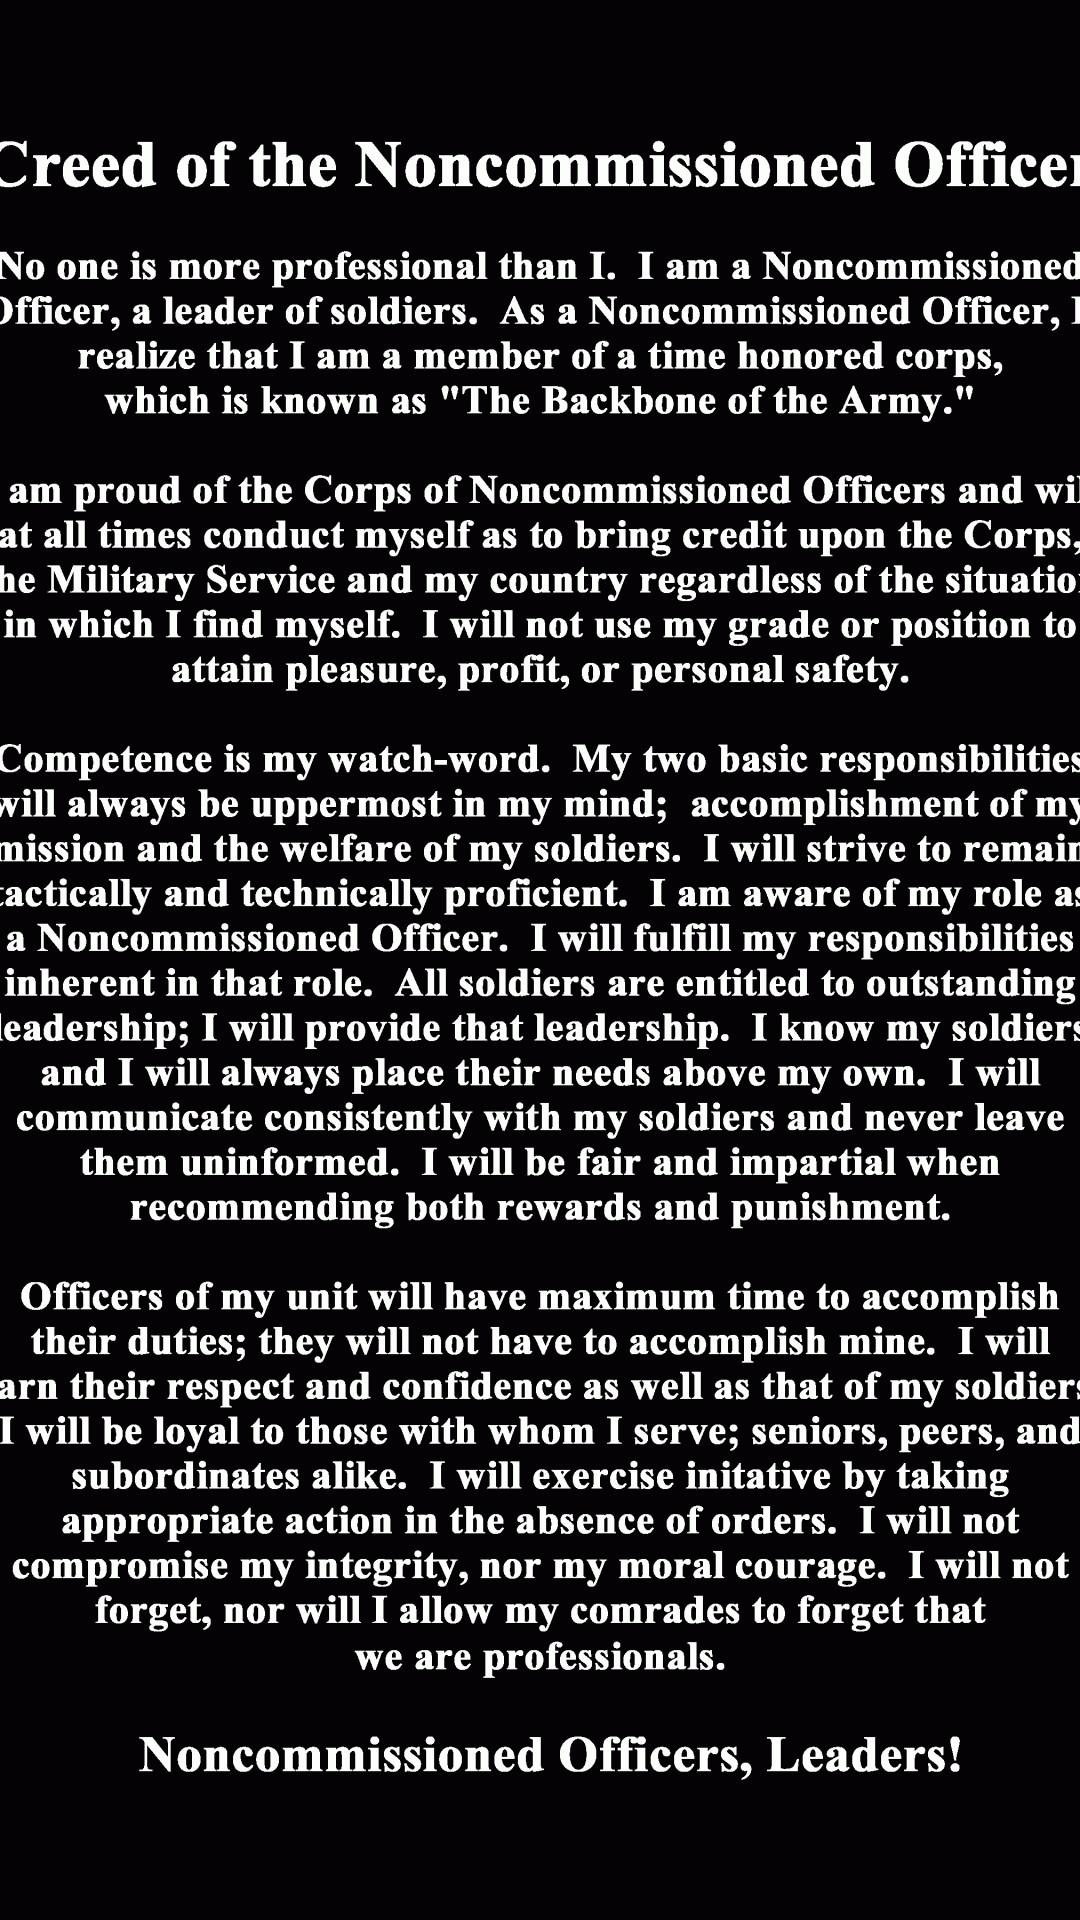 us army nco creed wallpaper